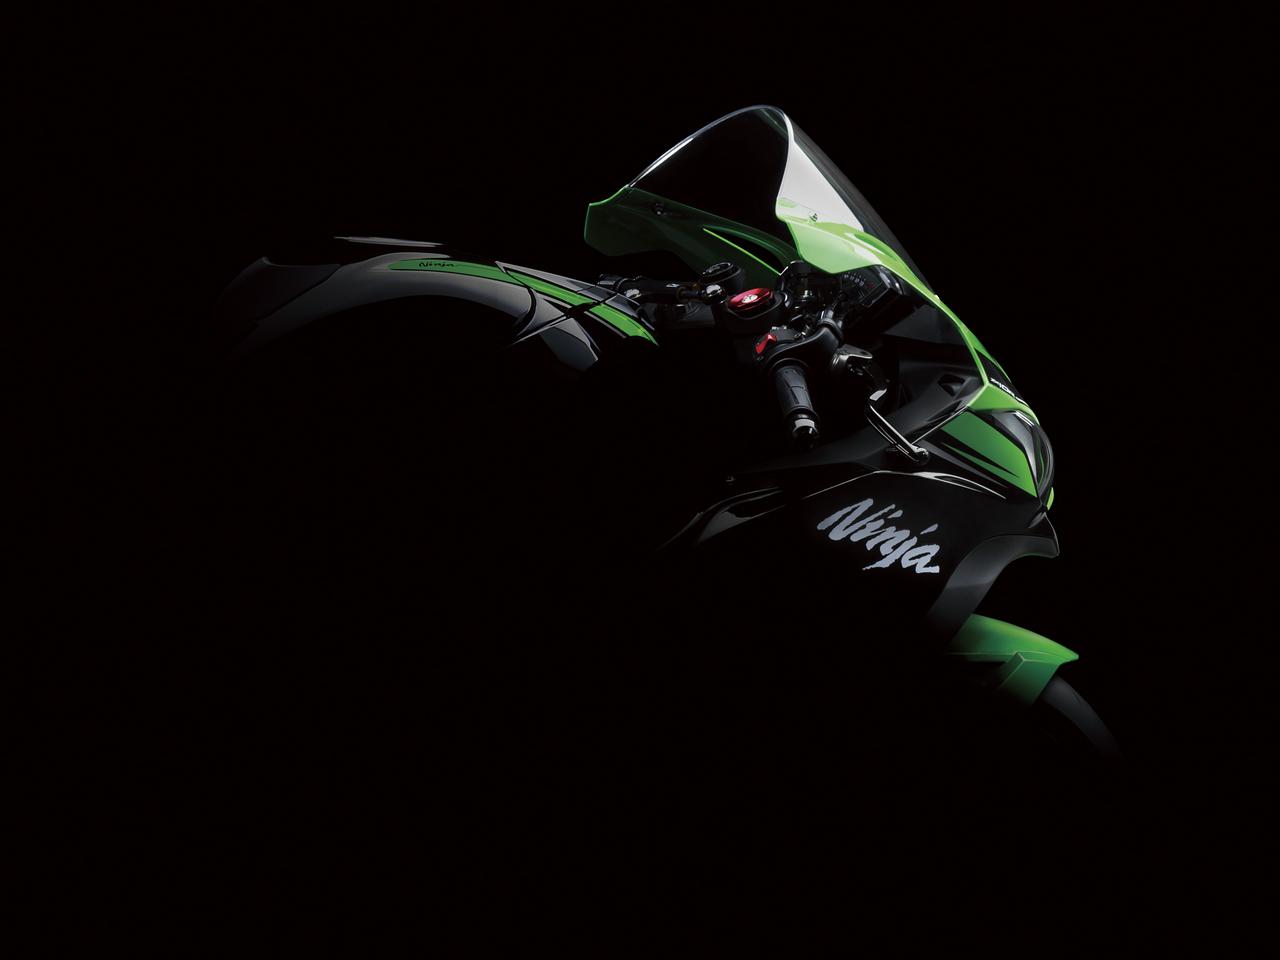 Kawasaki ZX10R 2016  et ZX10RR 2017 - Page 5 138205hininjazx10rteaserhires1